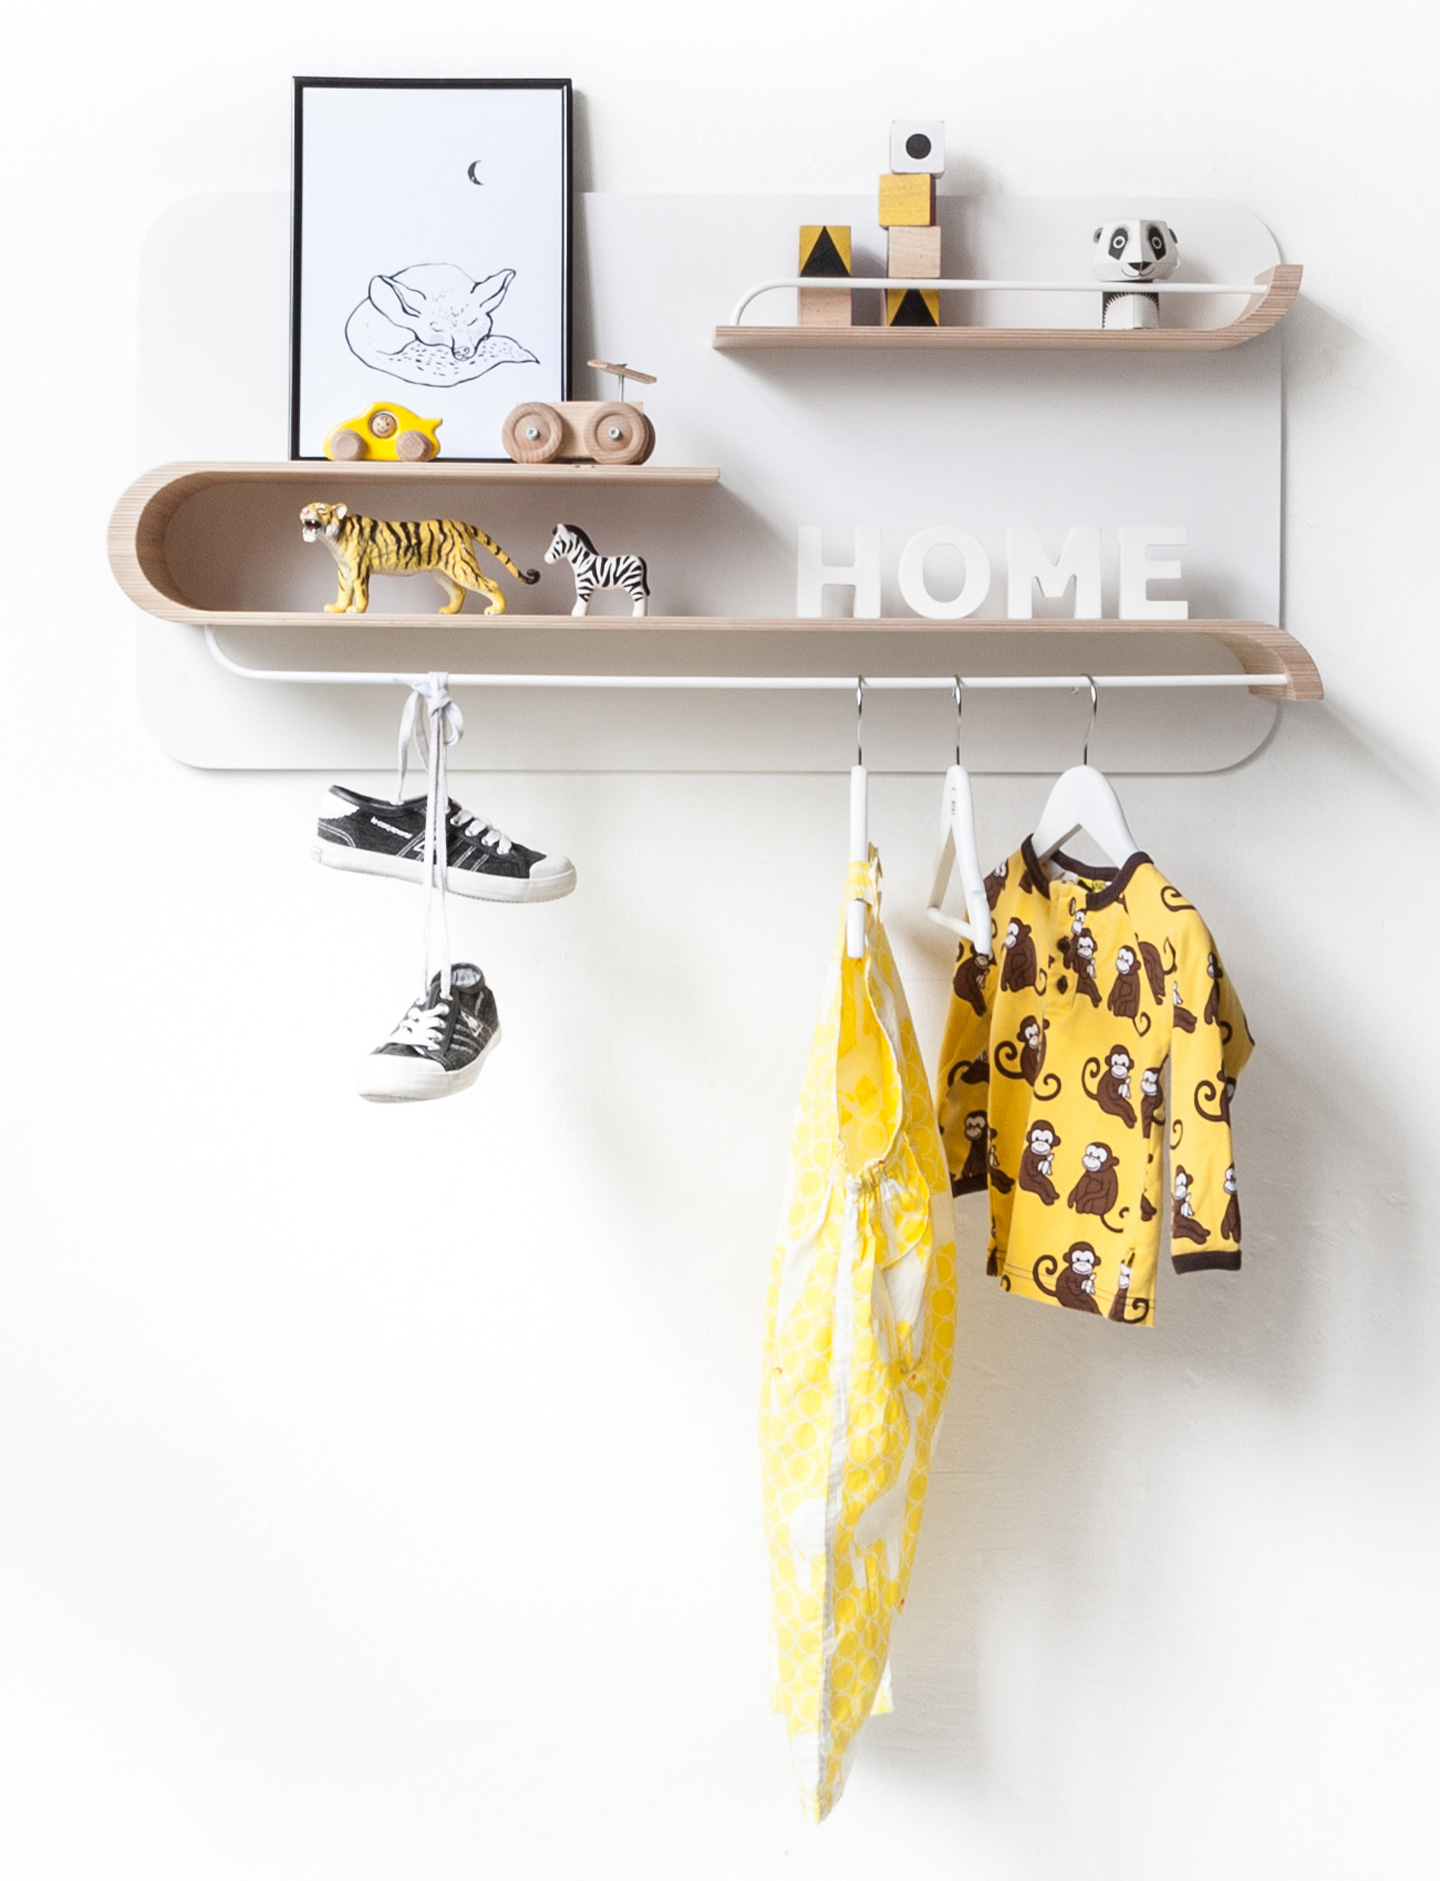 Rafa Kids L Shelf, European kids furniture design, natural plywood wall shelf for modern kids room and nursery decor